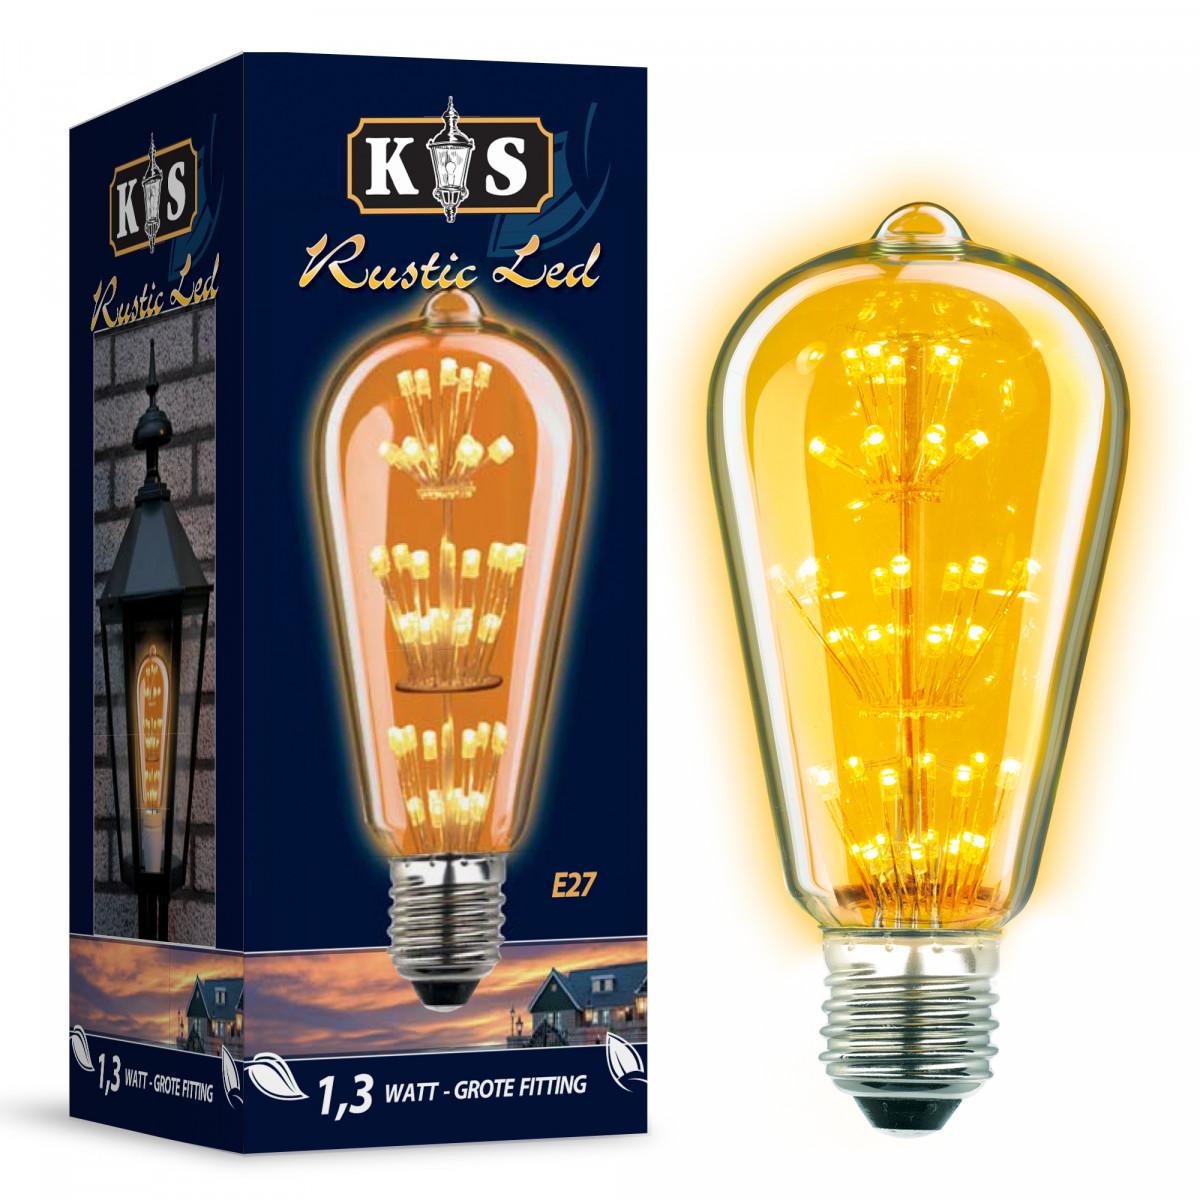 ledlamp lichtbron E27 - rustic led lamp 5882 - led buitenlamp